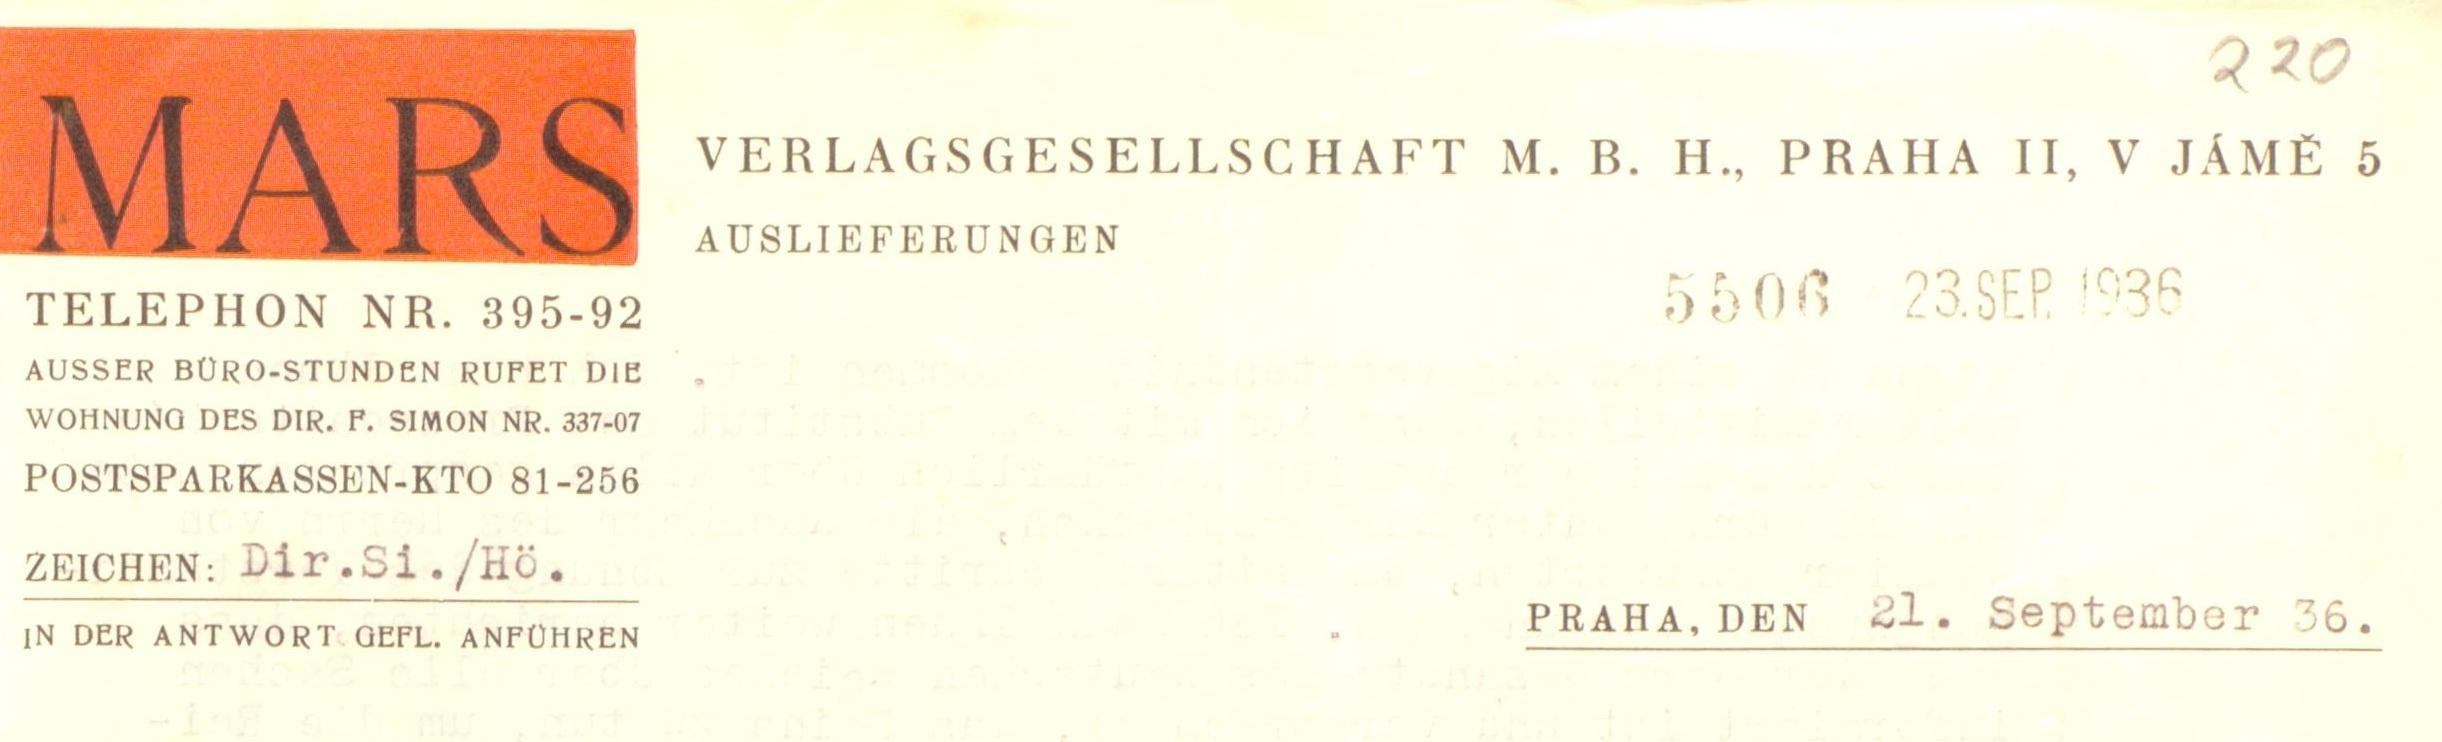 Mars Verlag Briefkopf